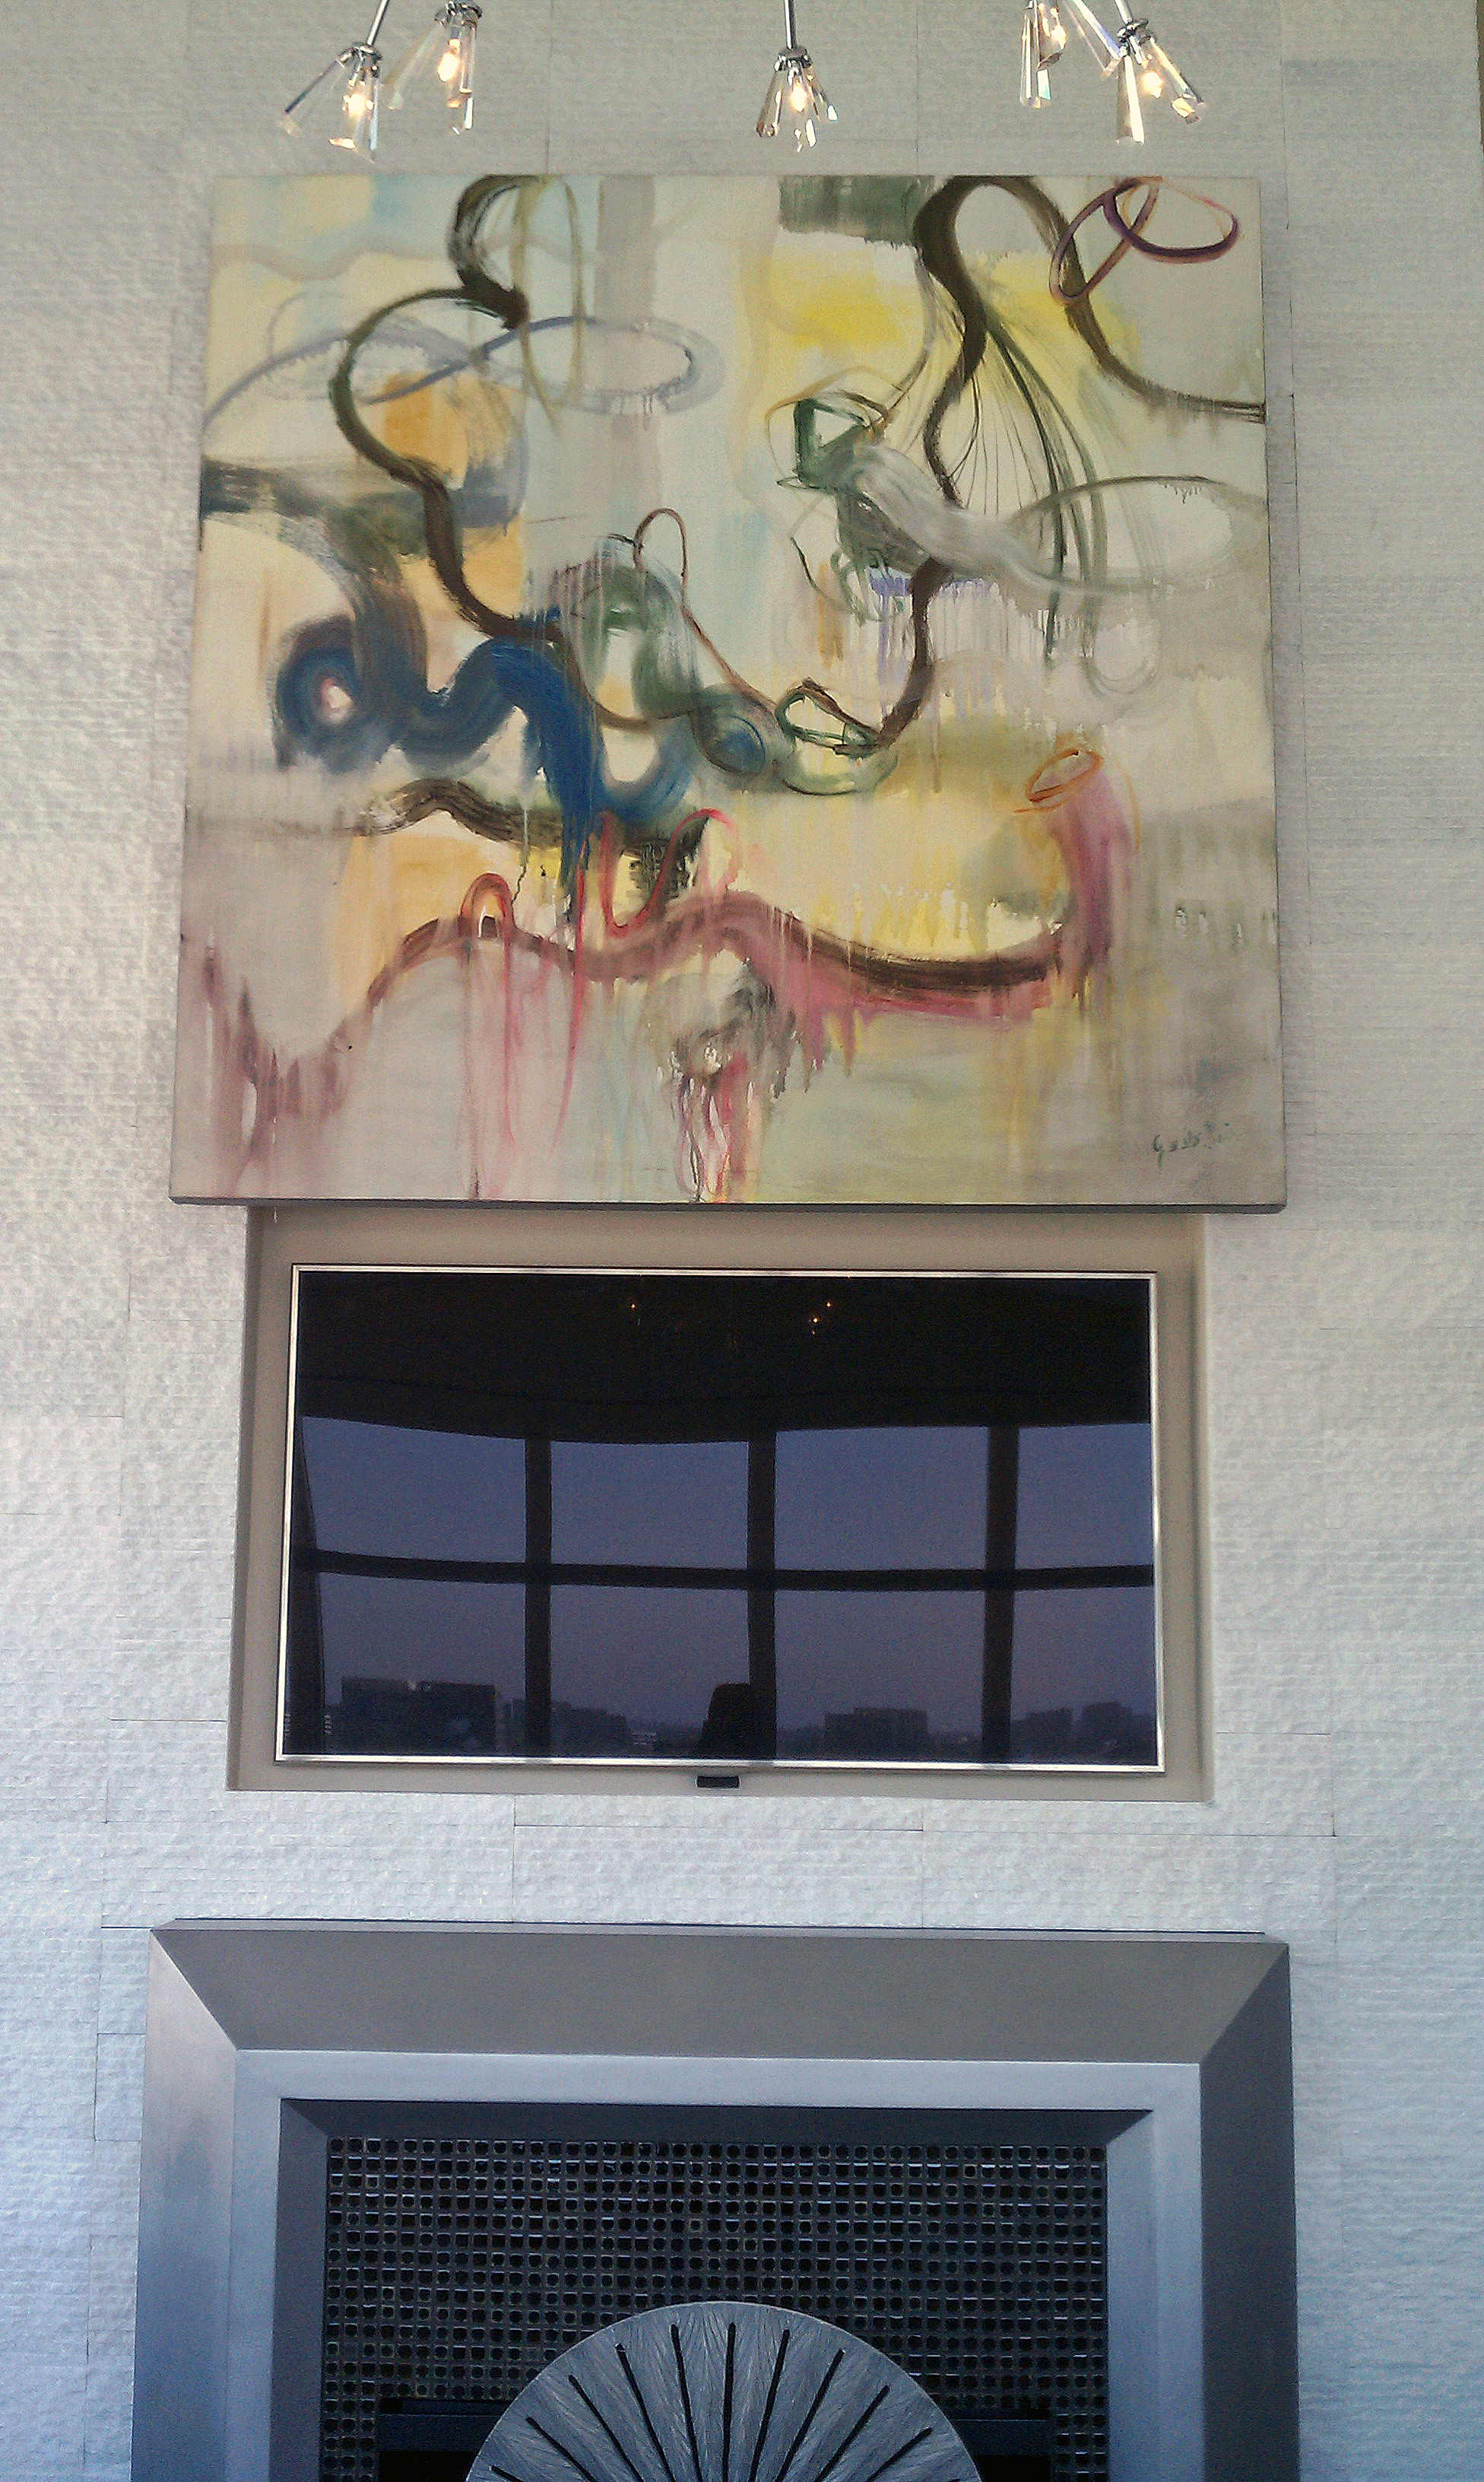 Orange County Art Installation - OC Art Installation Services